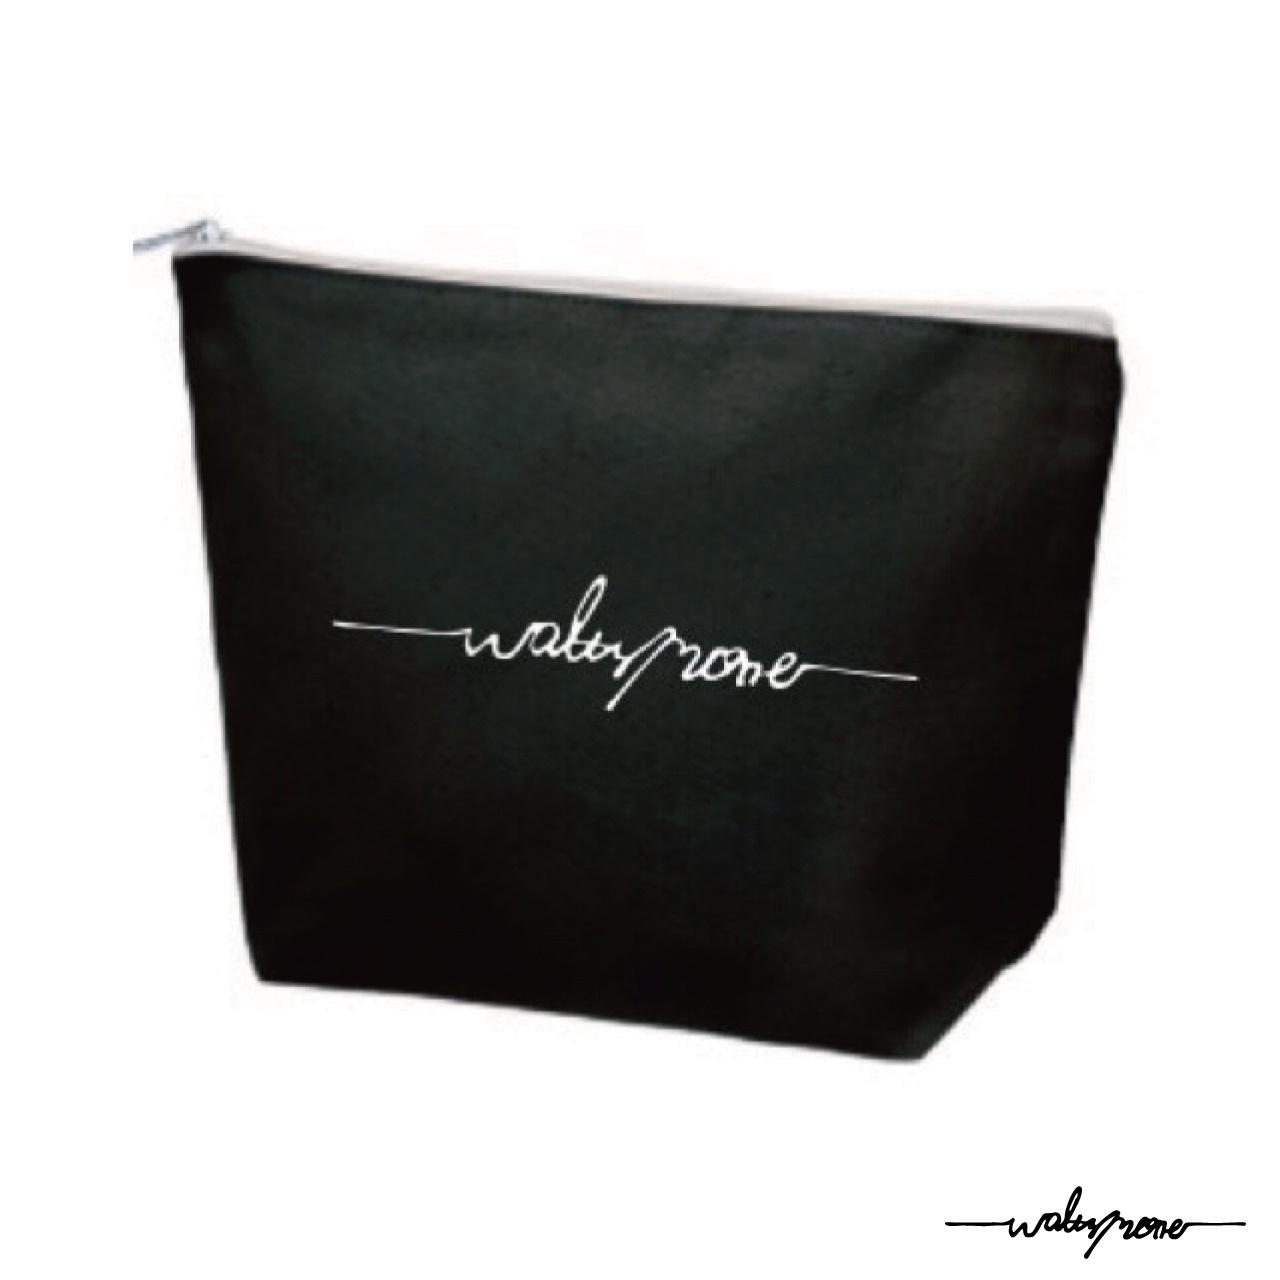 WALTZMORE logo pouch